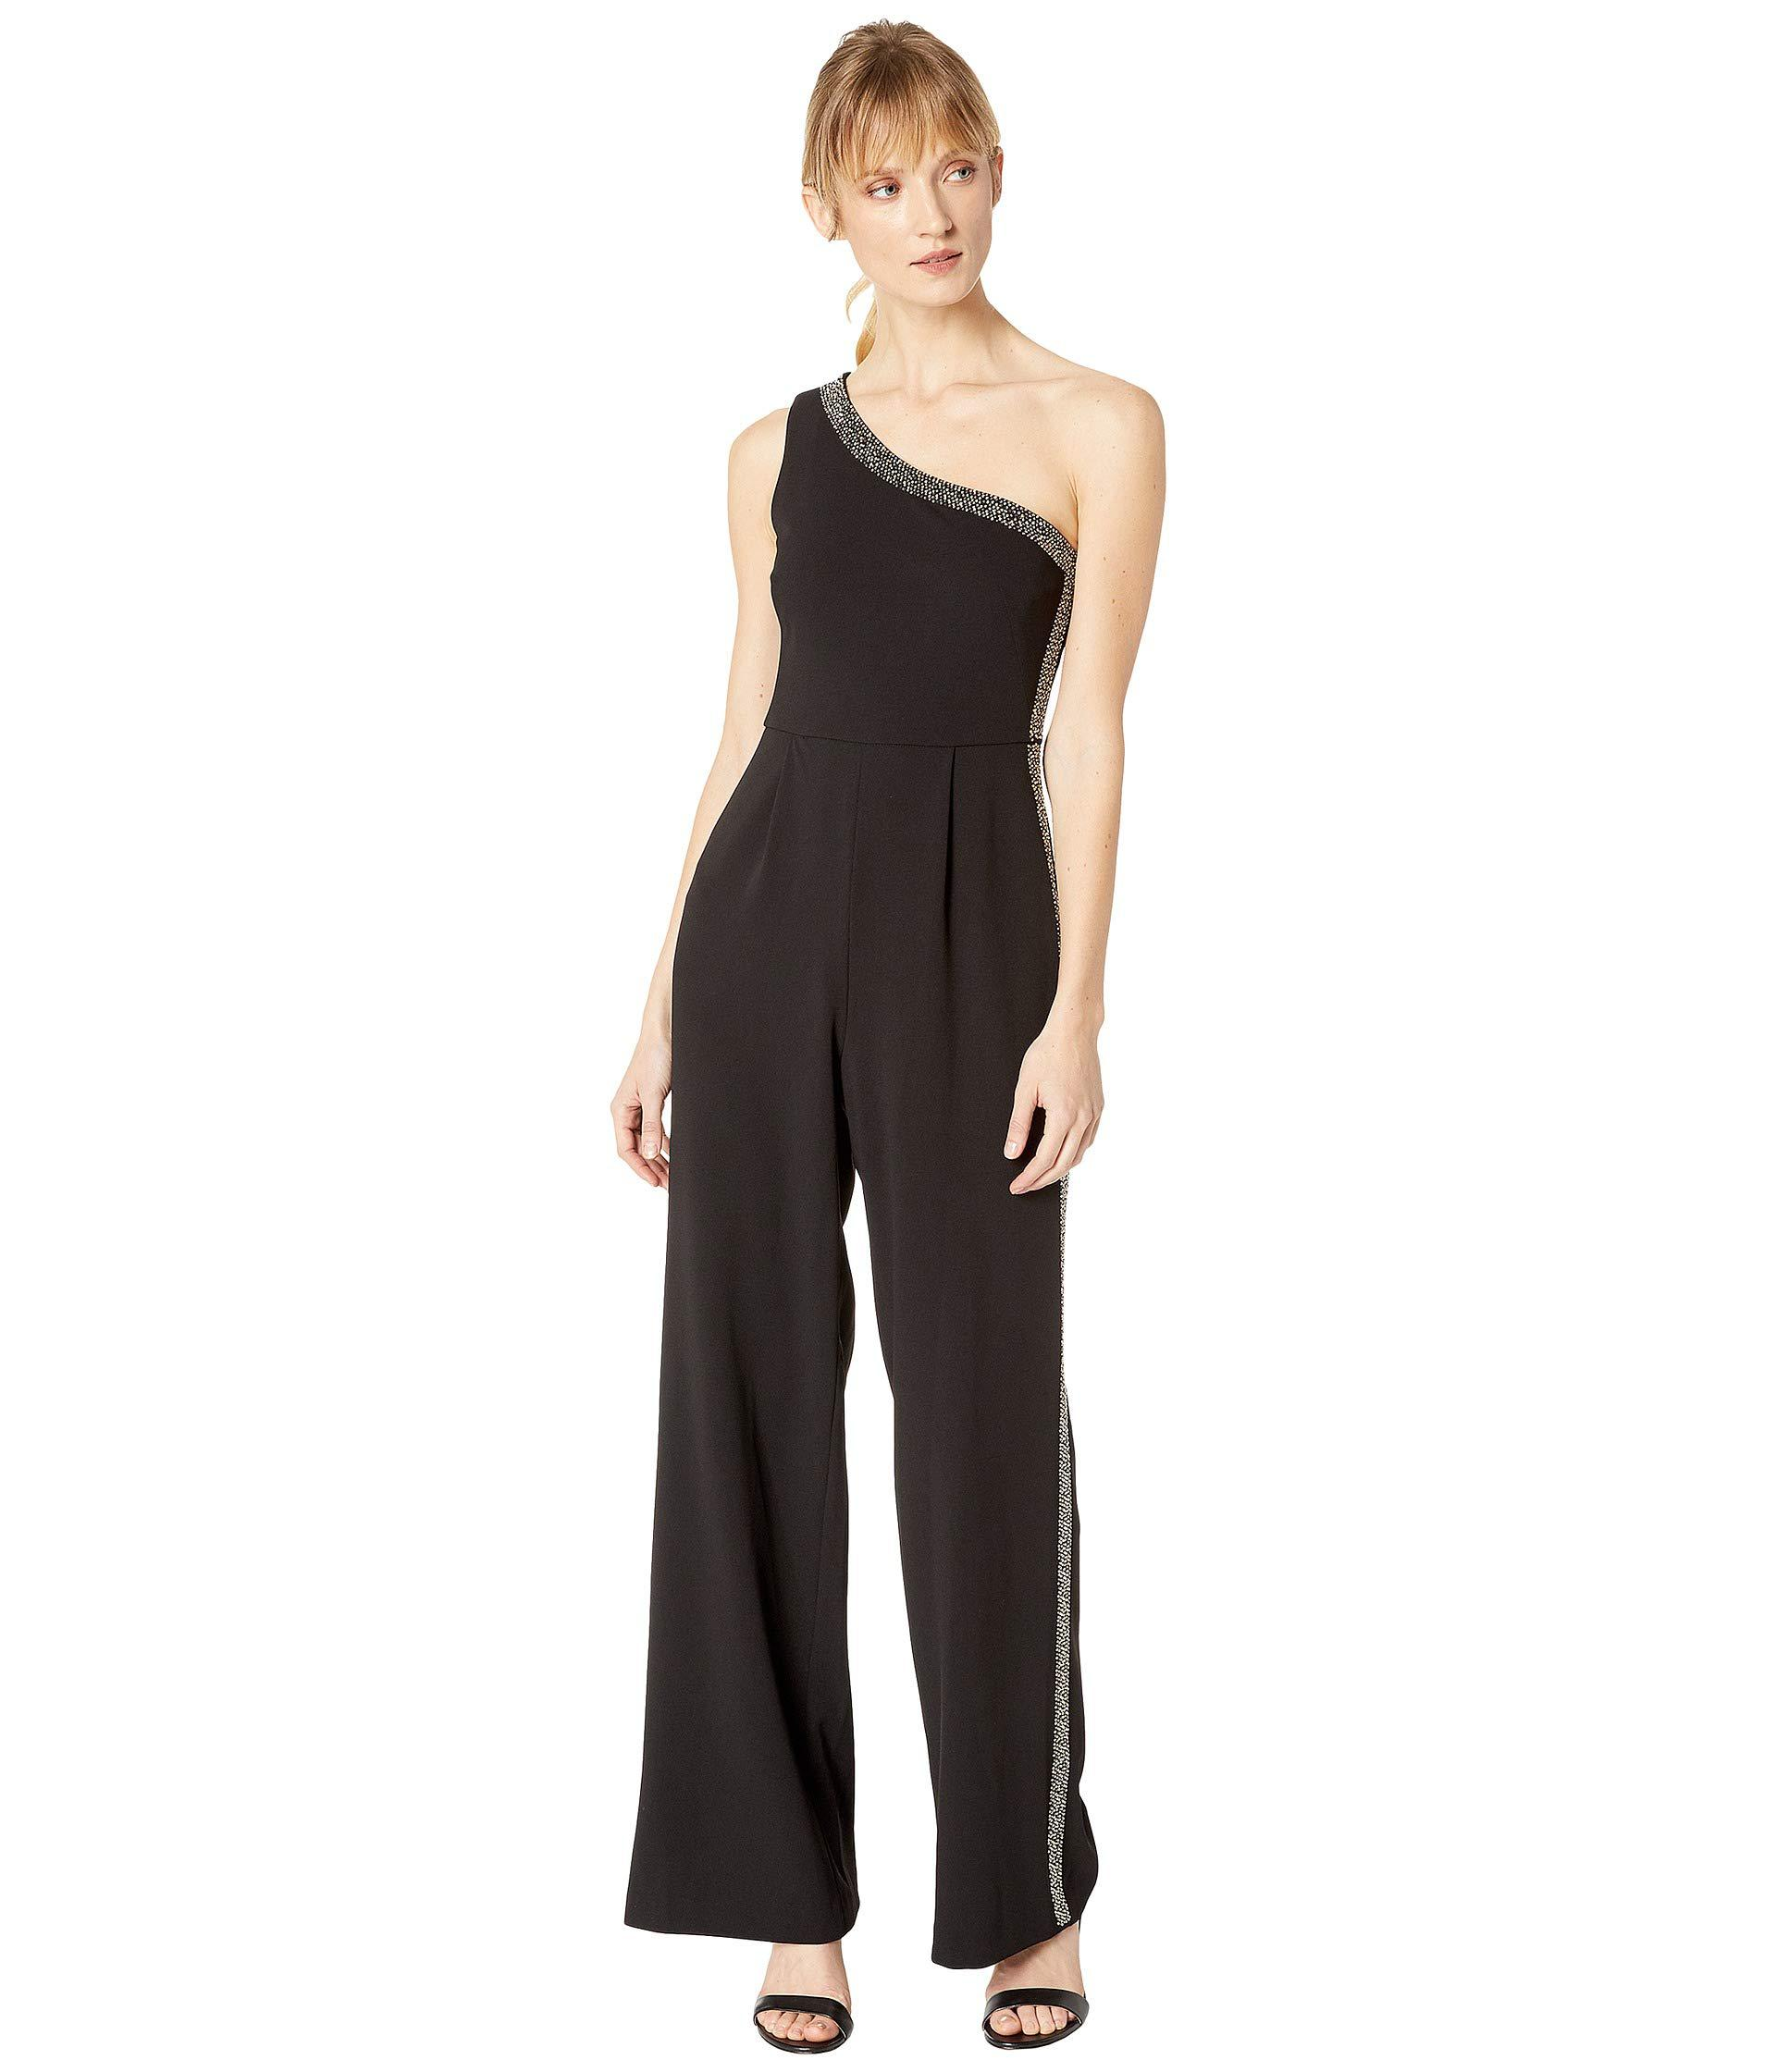 d5a9fb64b12 Lyst - Calvin Klein One Shoulder Embellished Neck And Side Pant ...